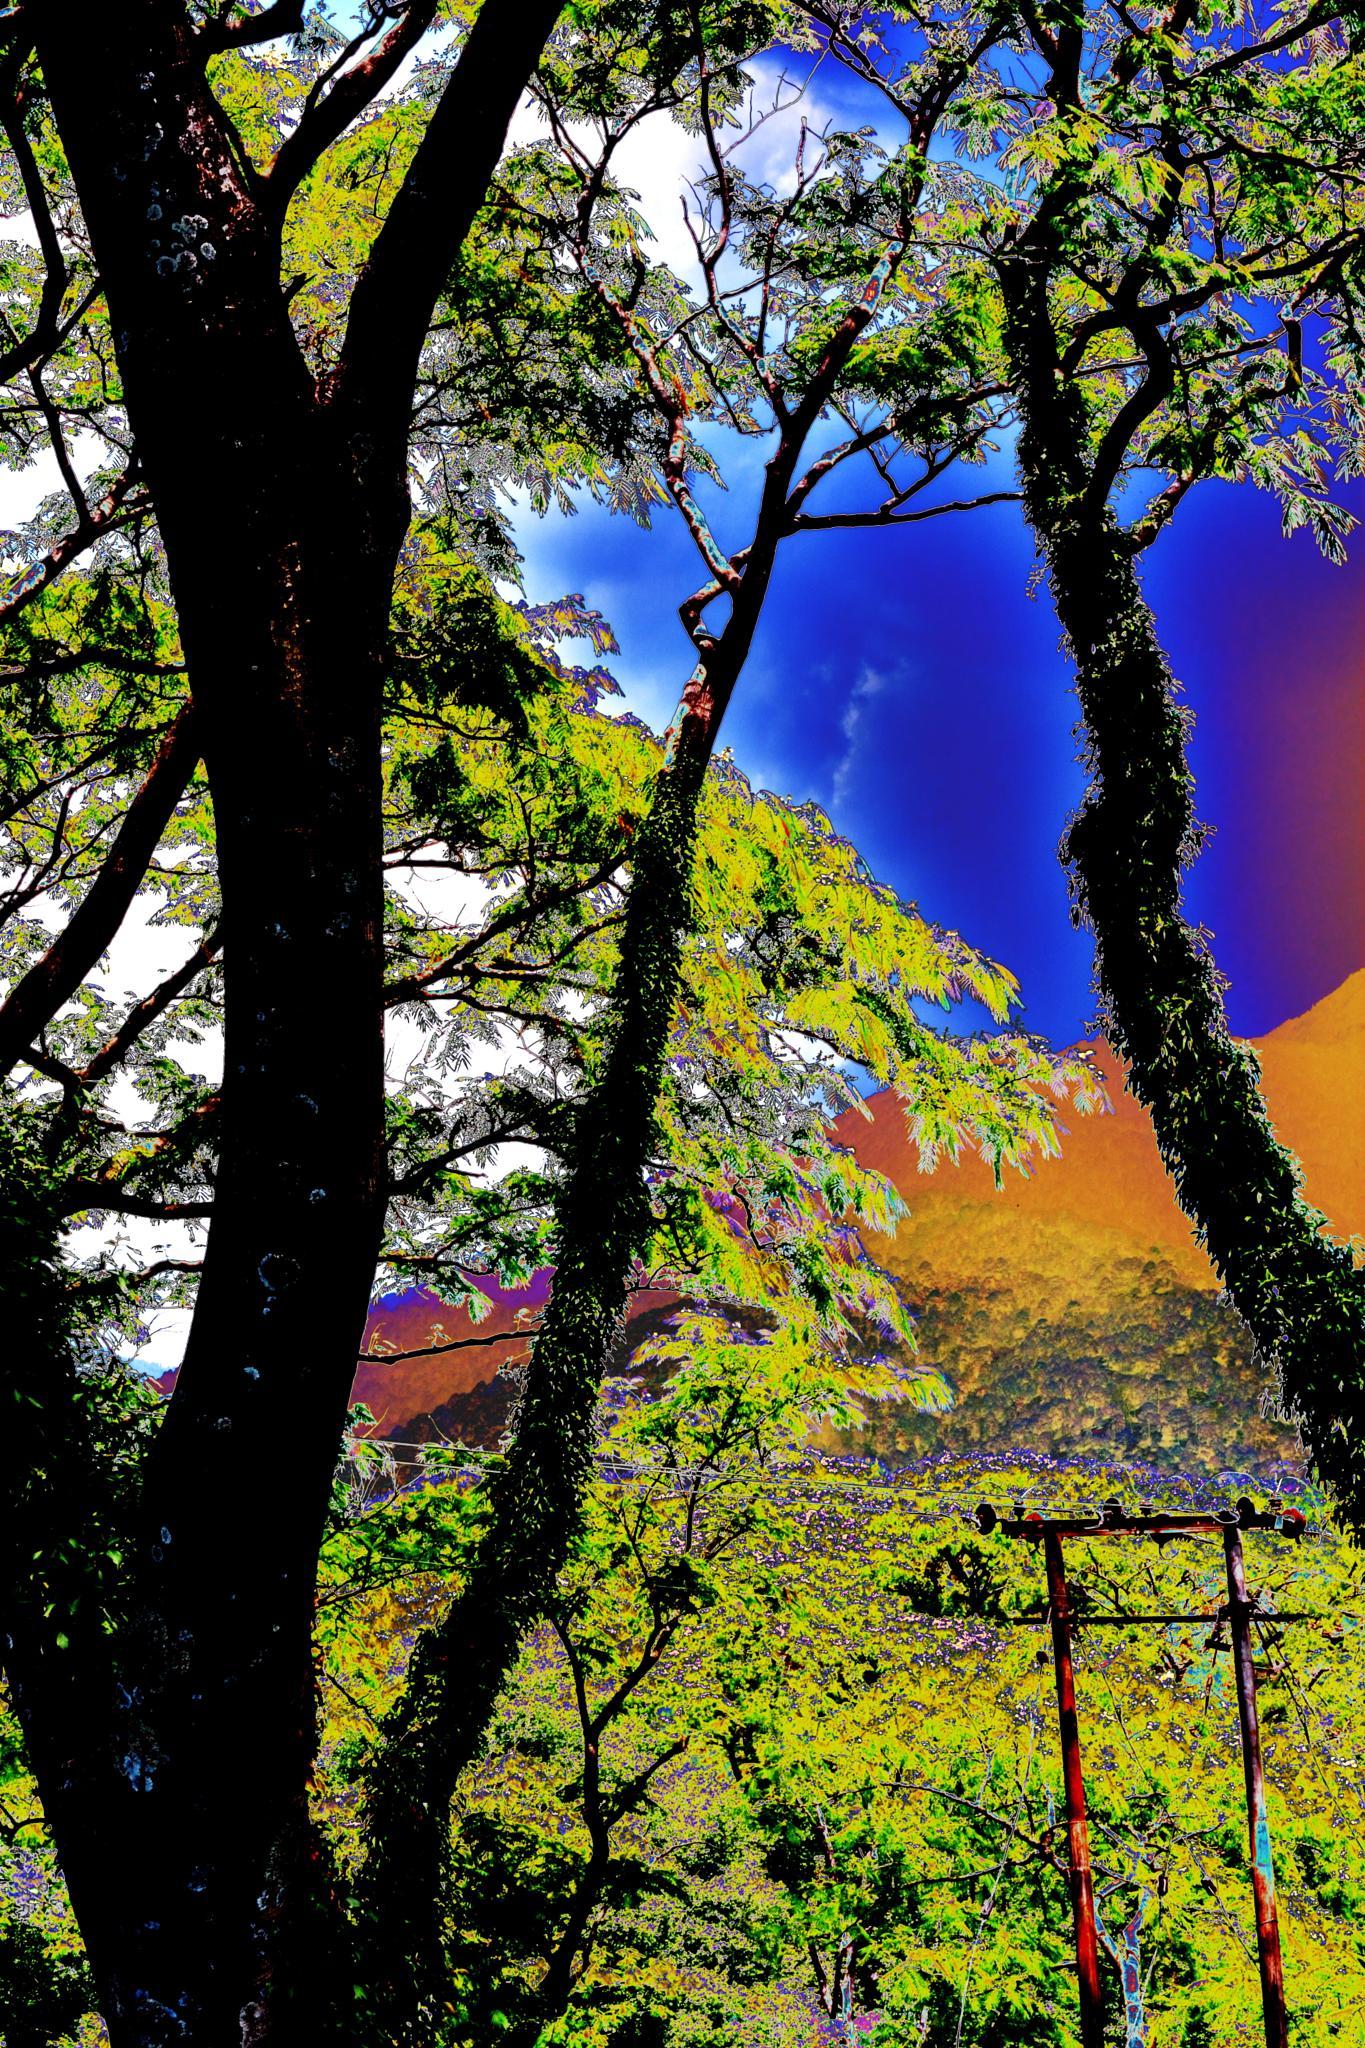 Photo Art-3 by Soummo